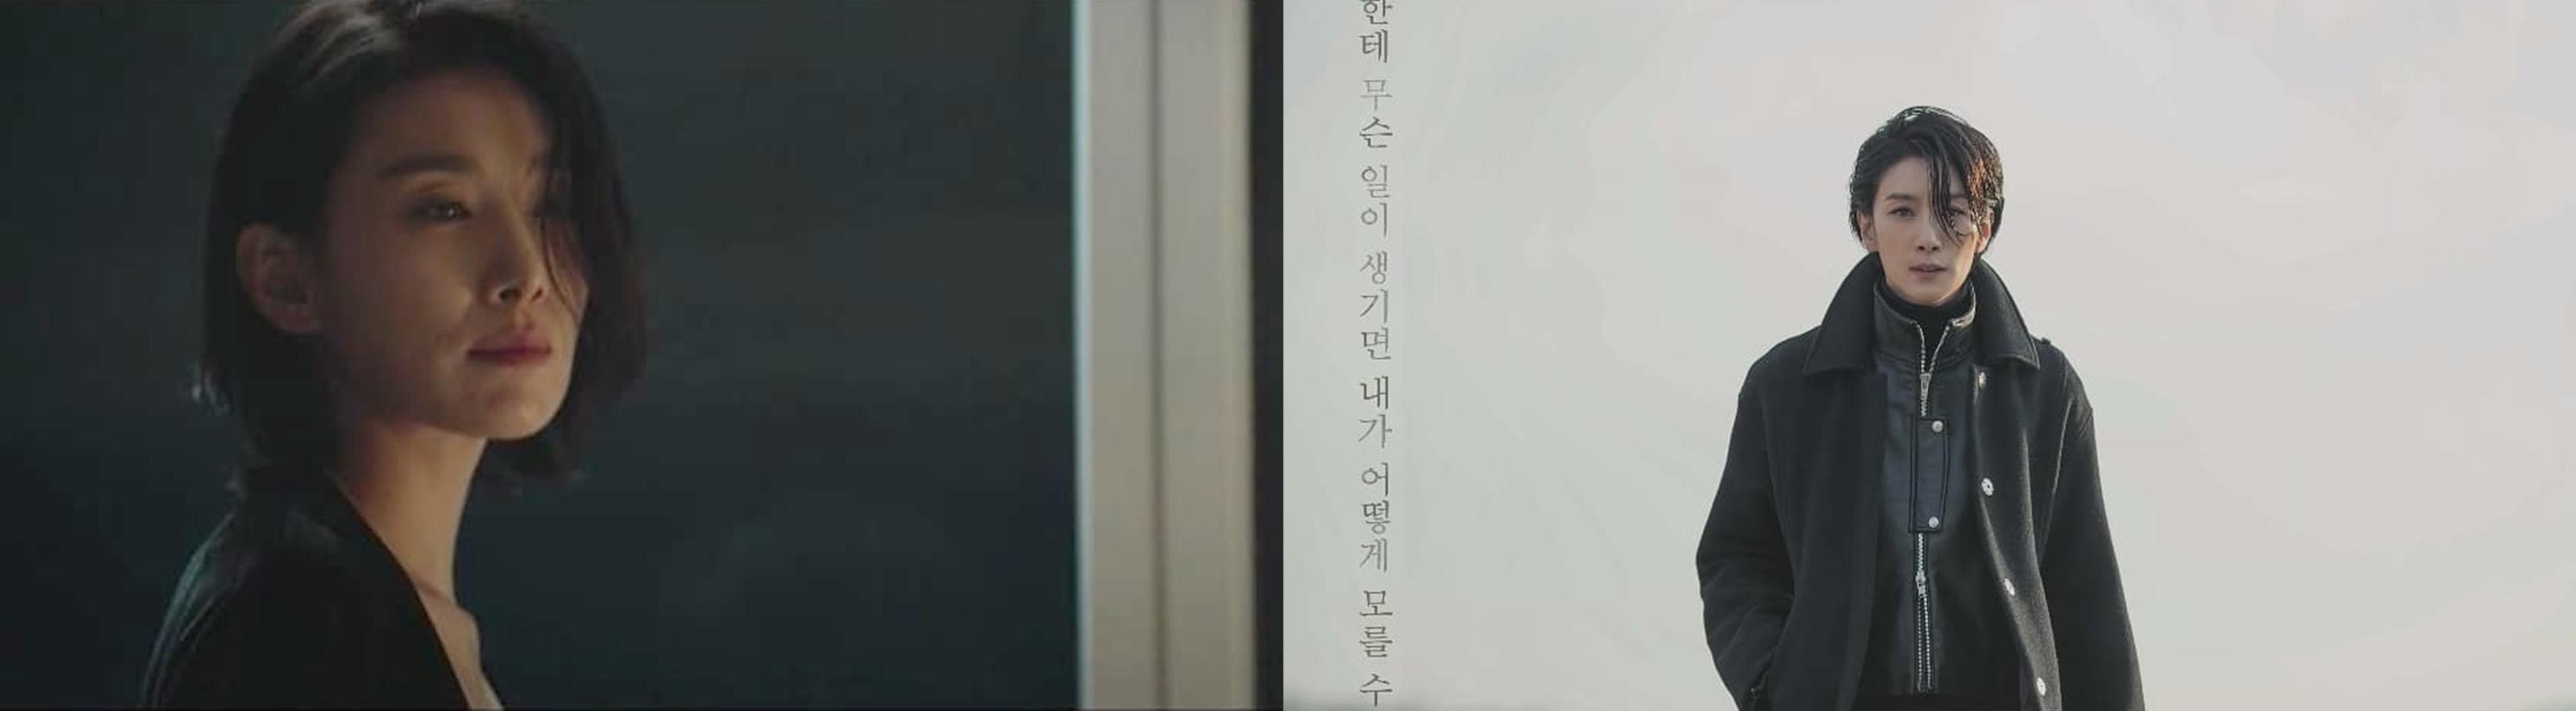 8 Drama Korea dibintangi Kim Seo-hyung, terbaru Nobody Knows